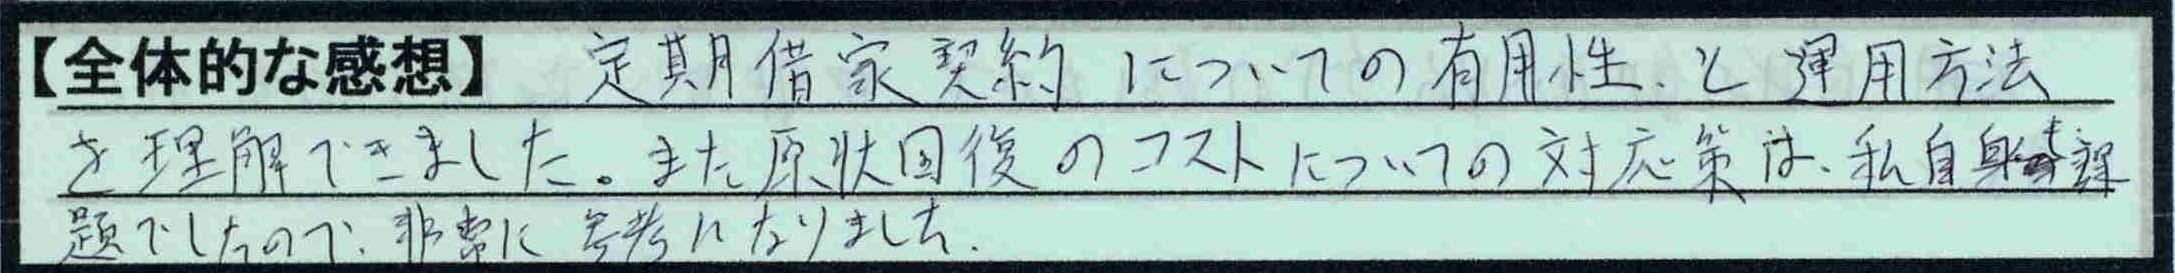 【神奈川県川崎市】【須山弘孝さん】【全体感想】